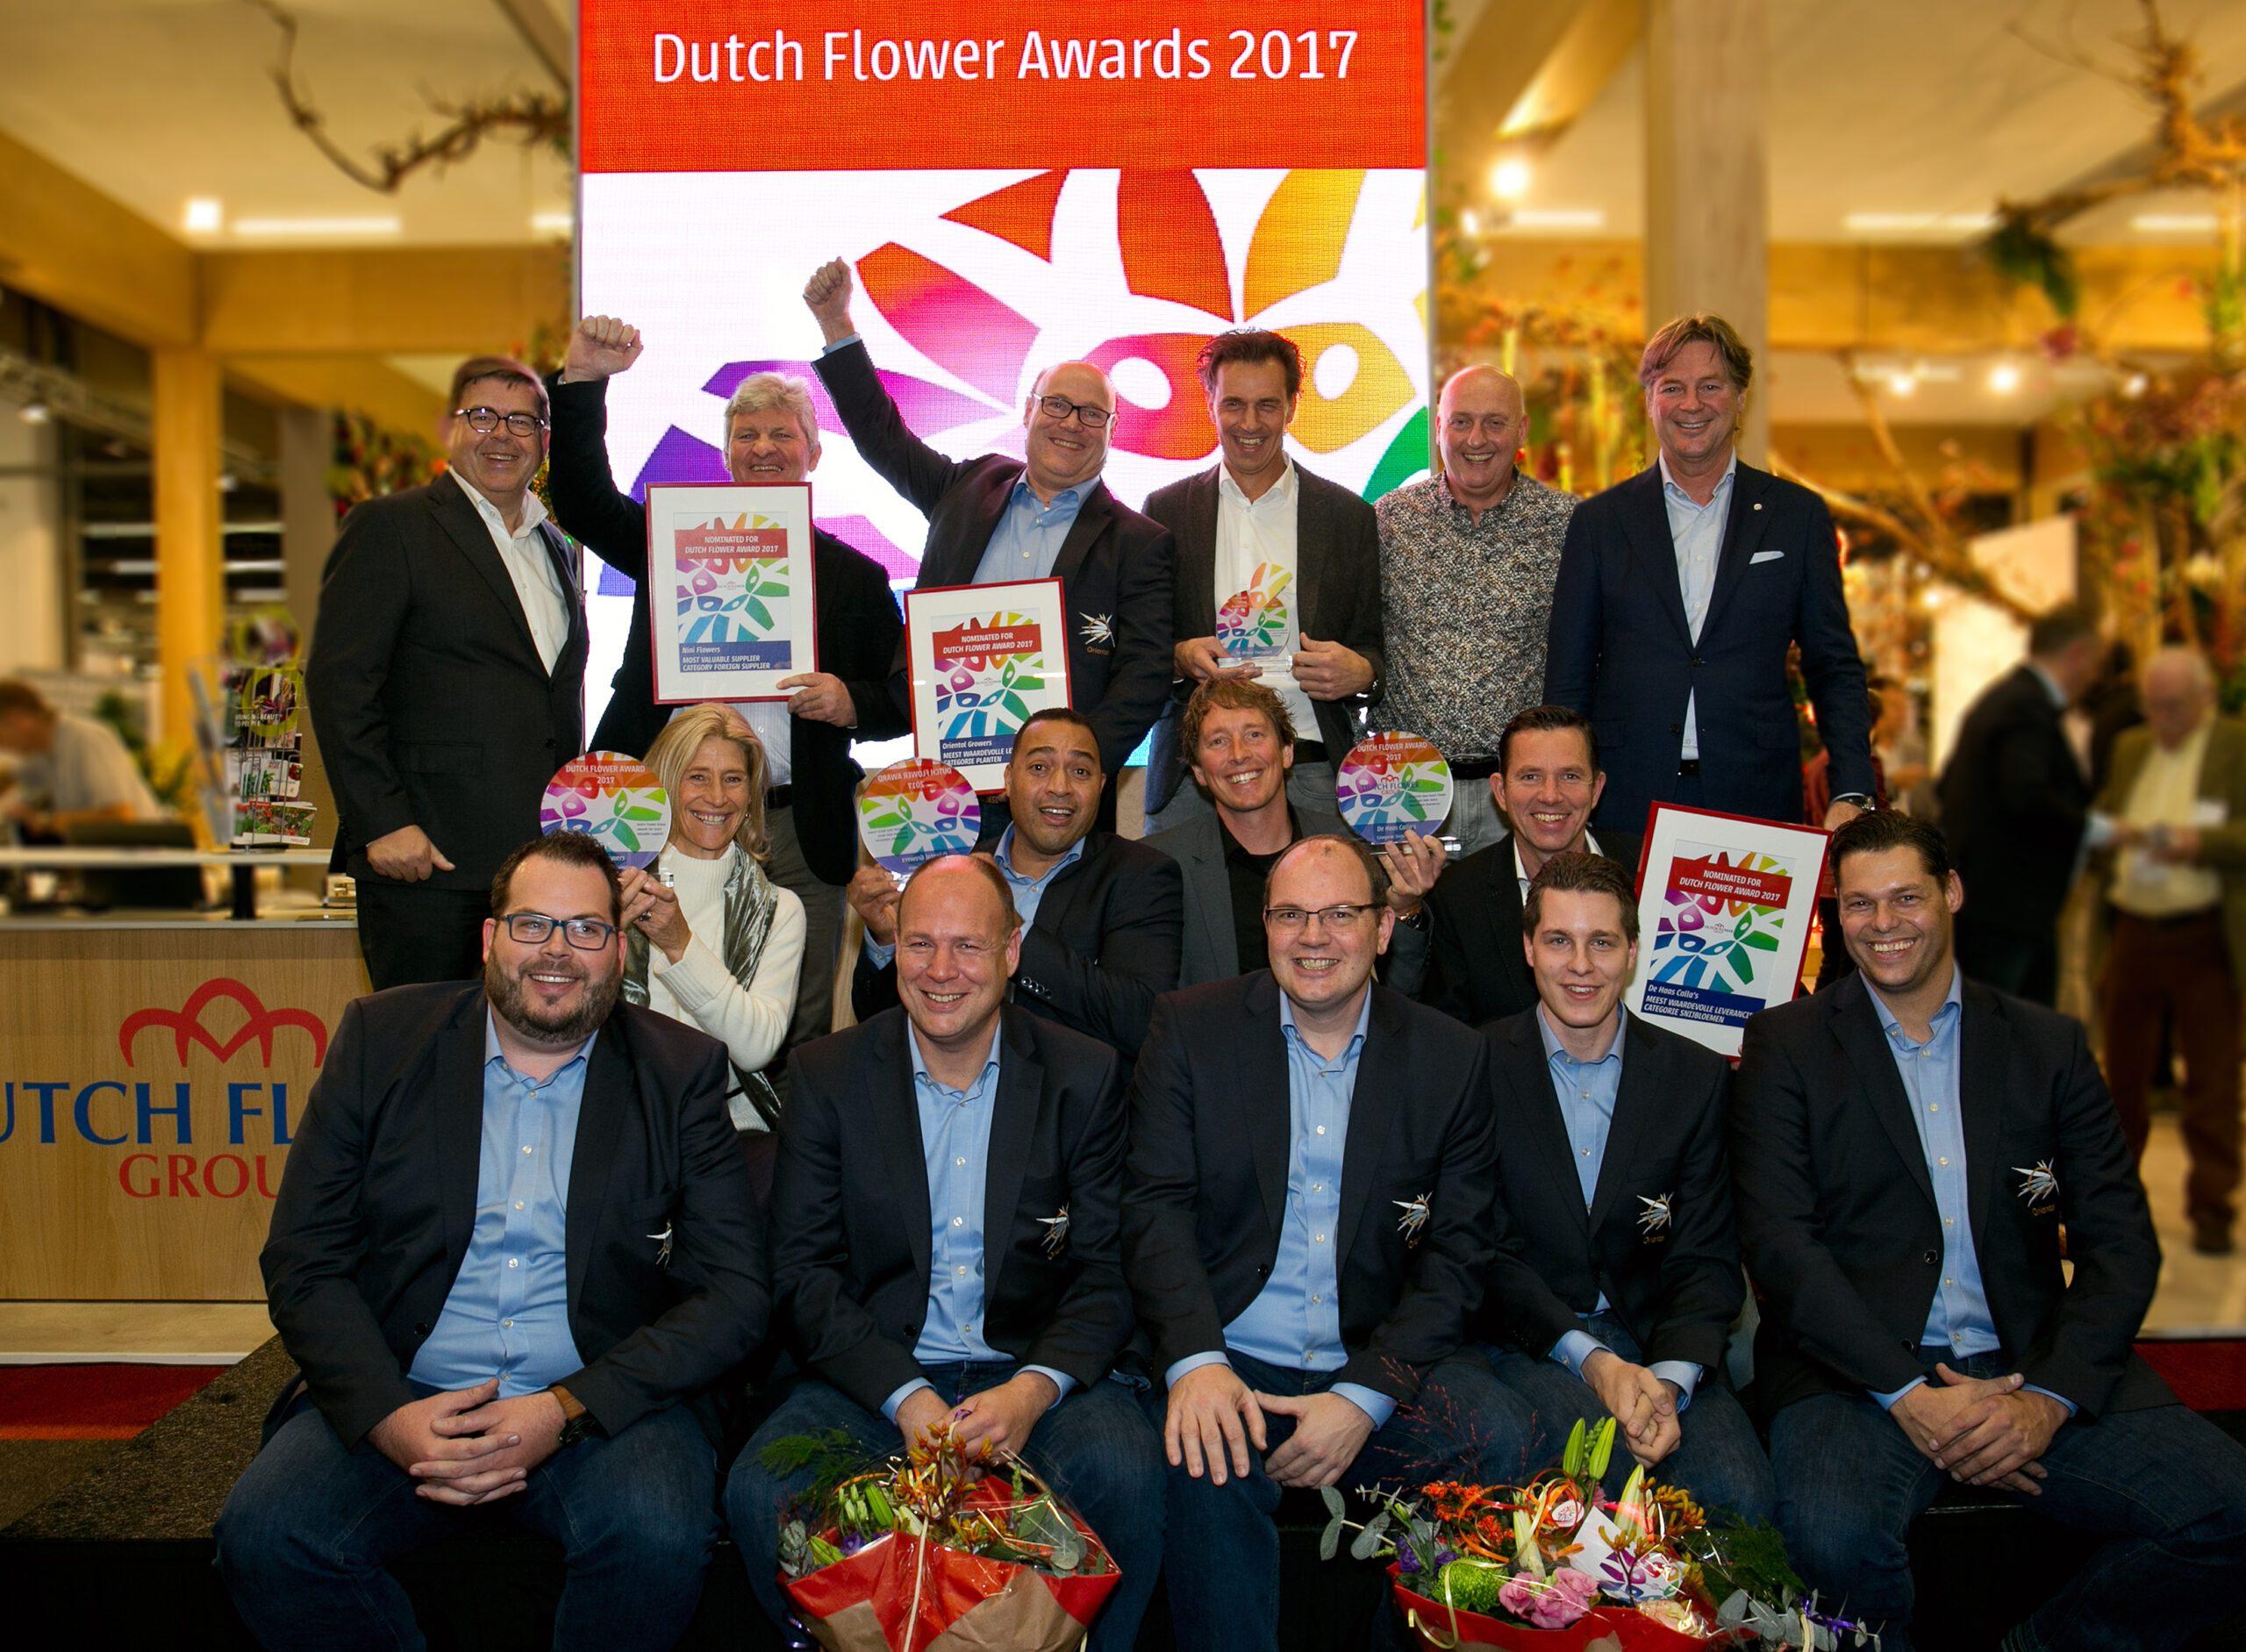 Winnaars Dutch Flower Awards 2017_foto